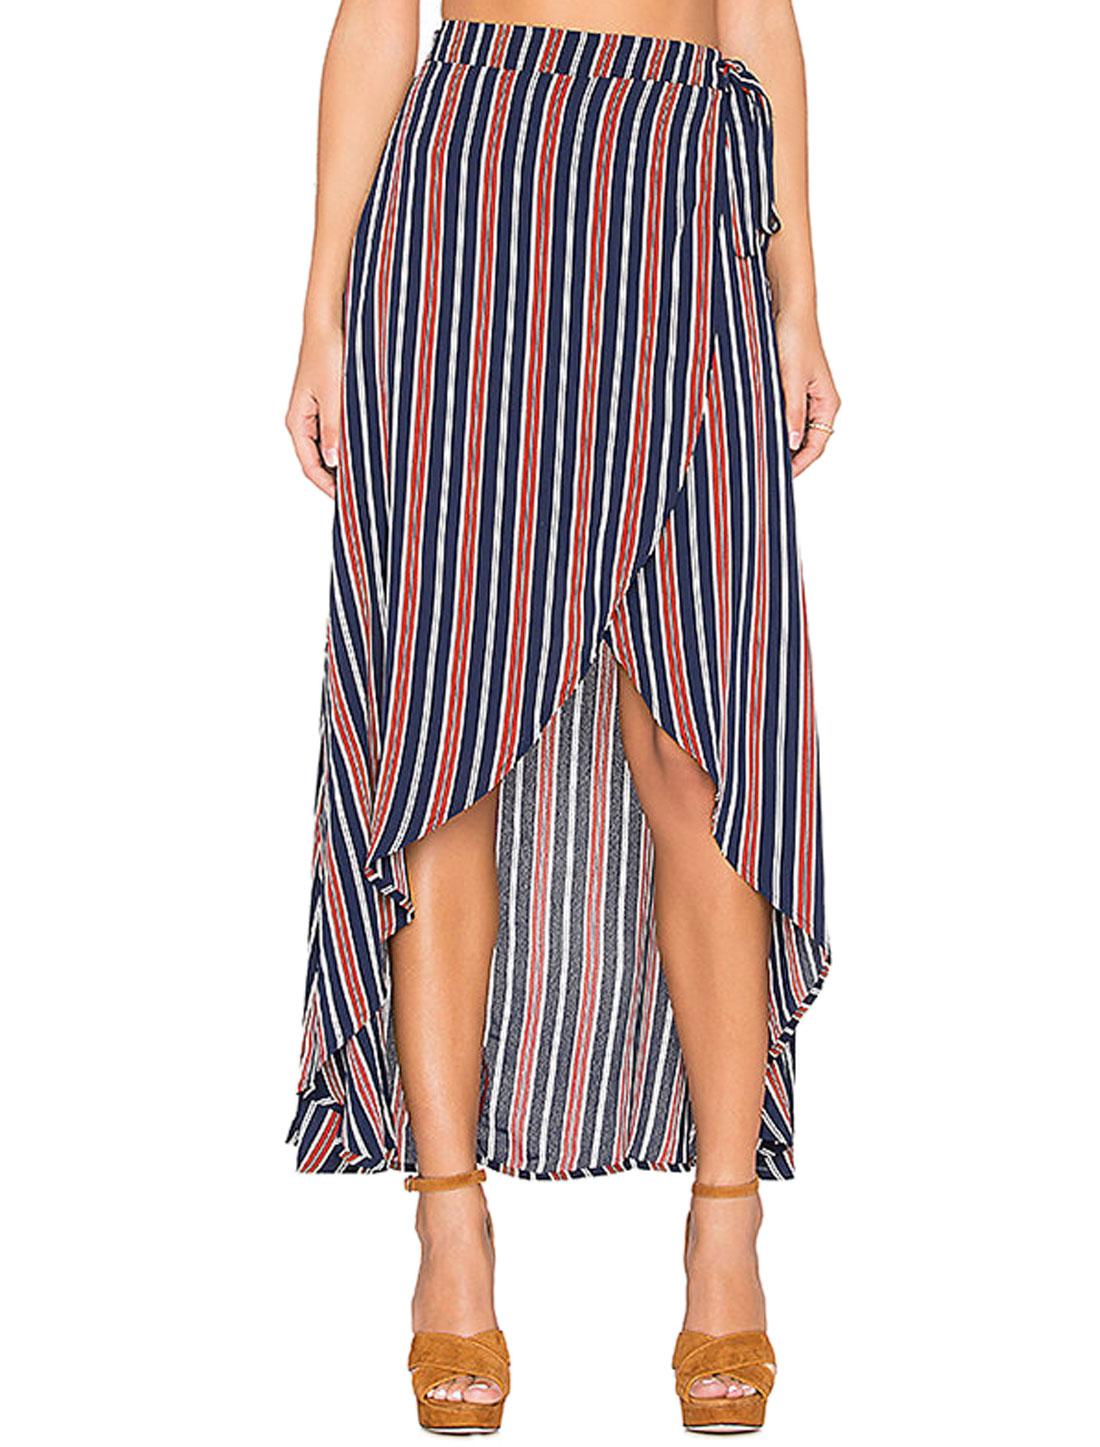 Women Stripes Contrast Color Wrap Design Belted Maxi Skirt Blue S